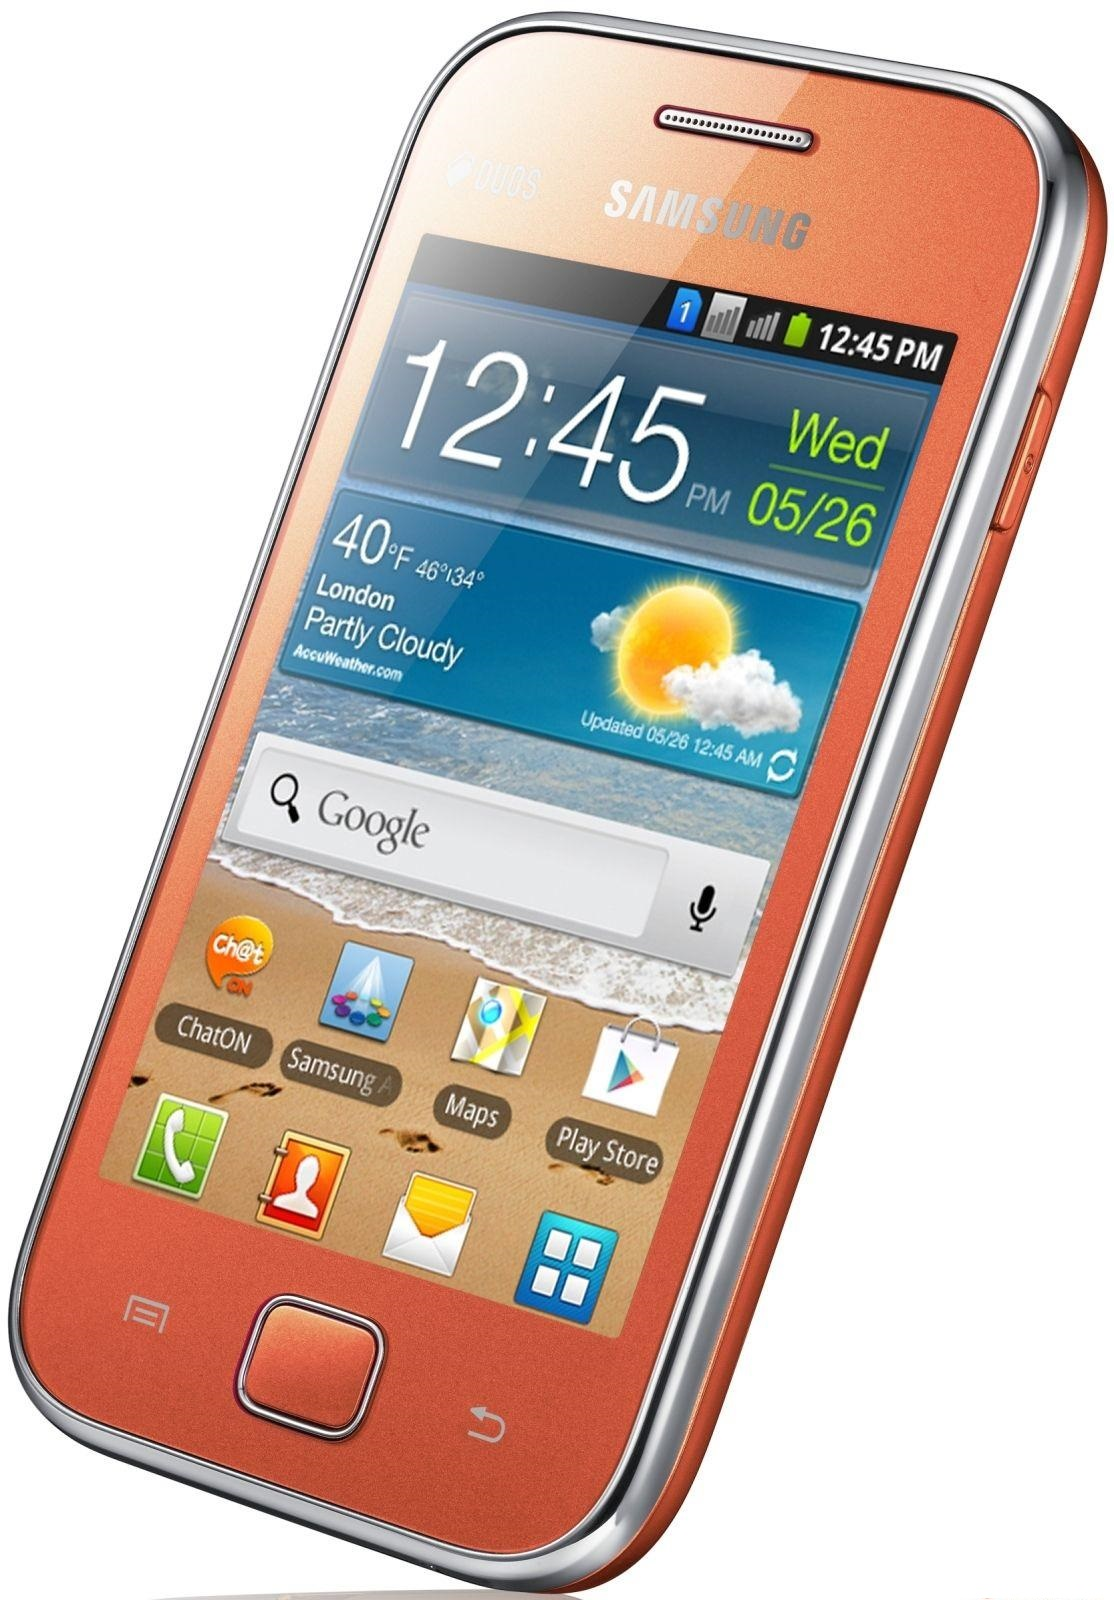 Harga Obral Case Mirror Aluminium Bumper Casing For Samsung Galaxy J1 Ace Ve J111f 8gb Hitam 2016 Blue Page 4 Daftar Update